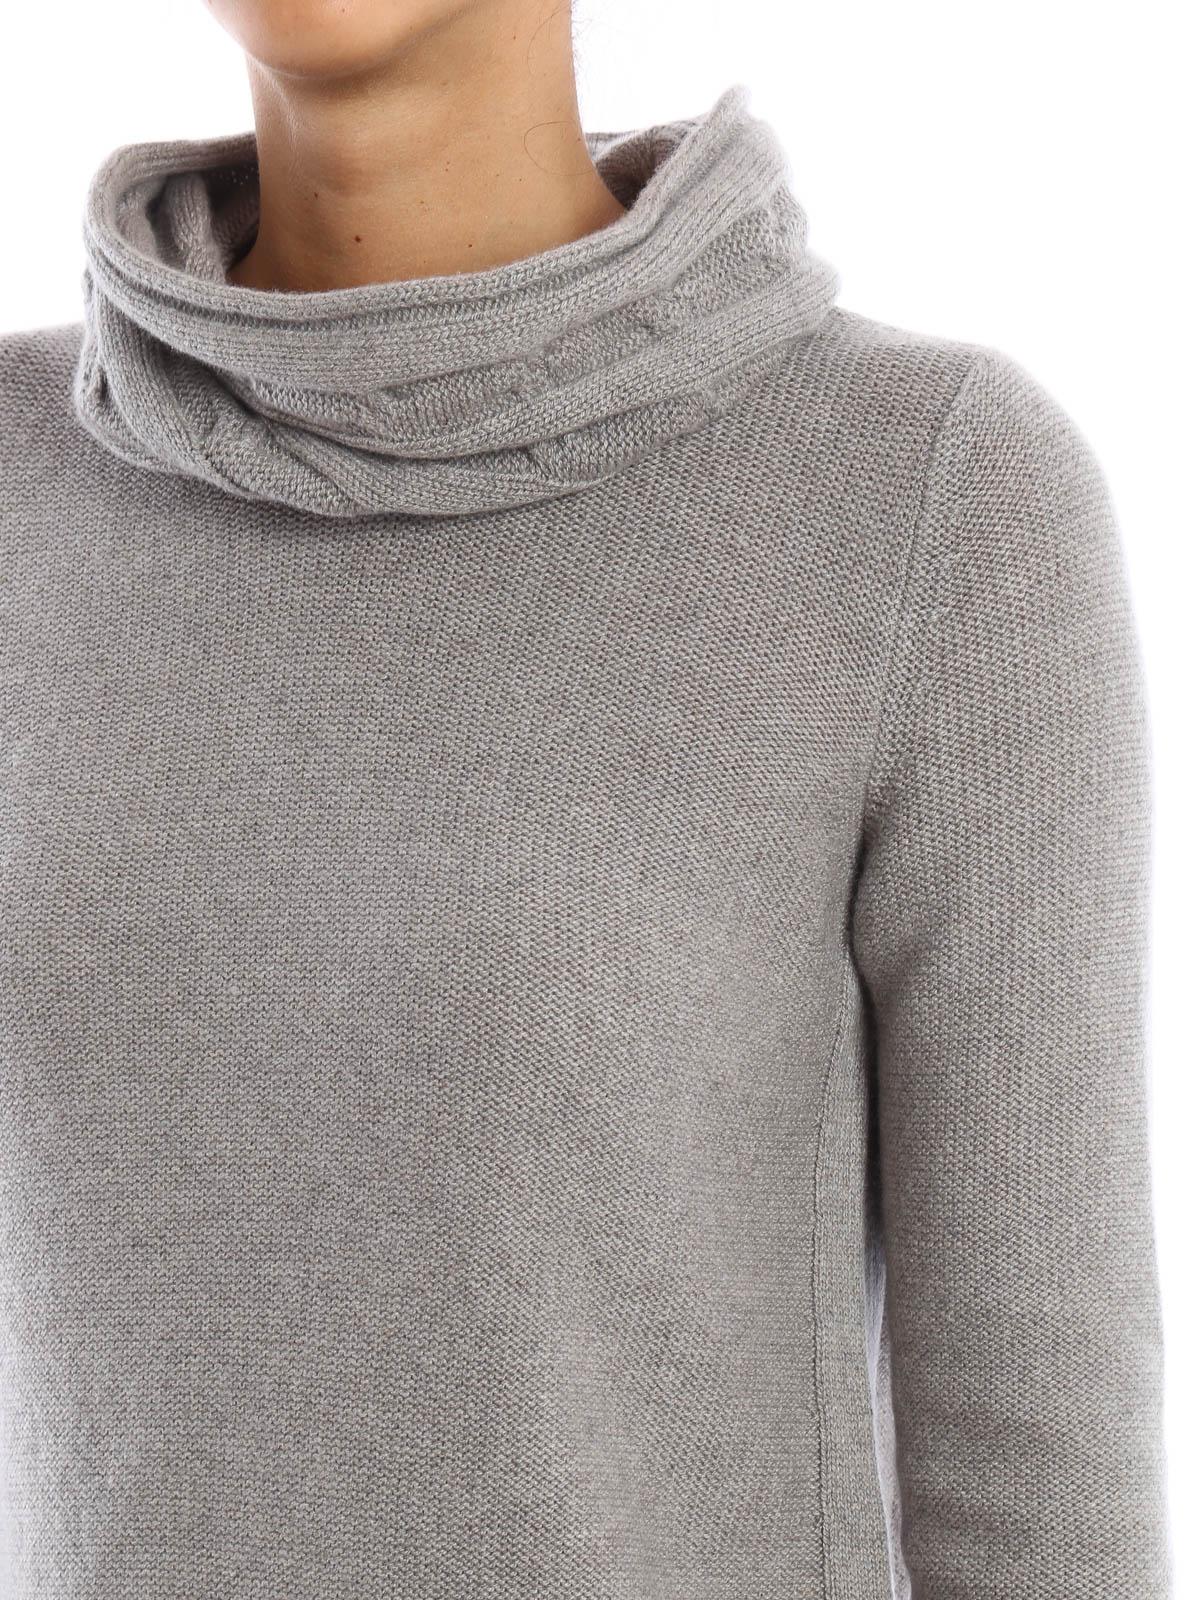 Loro Piana Kimberley Cashmere Sweater Col Roulé Col Polo